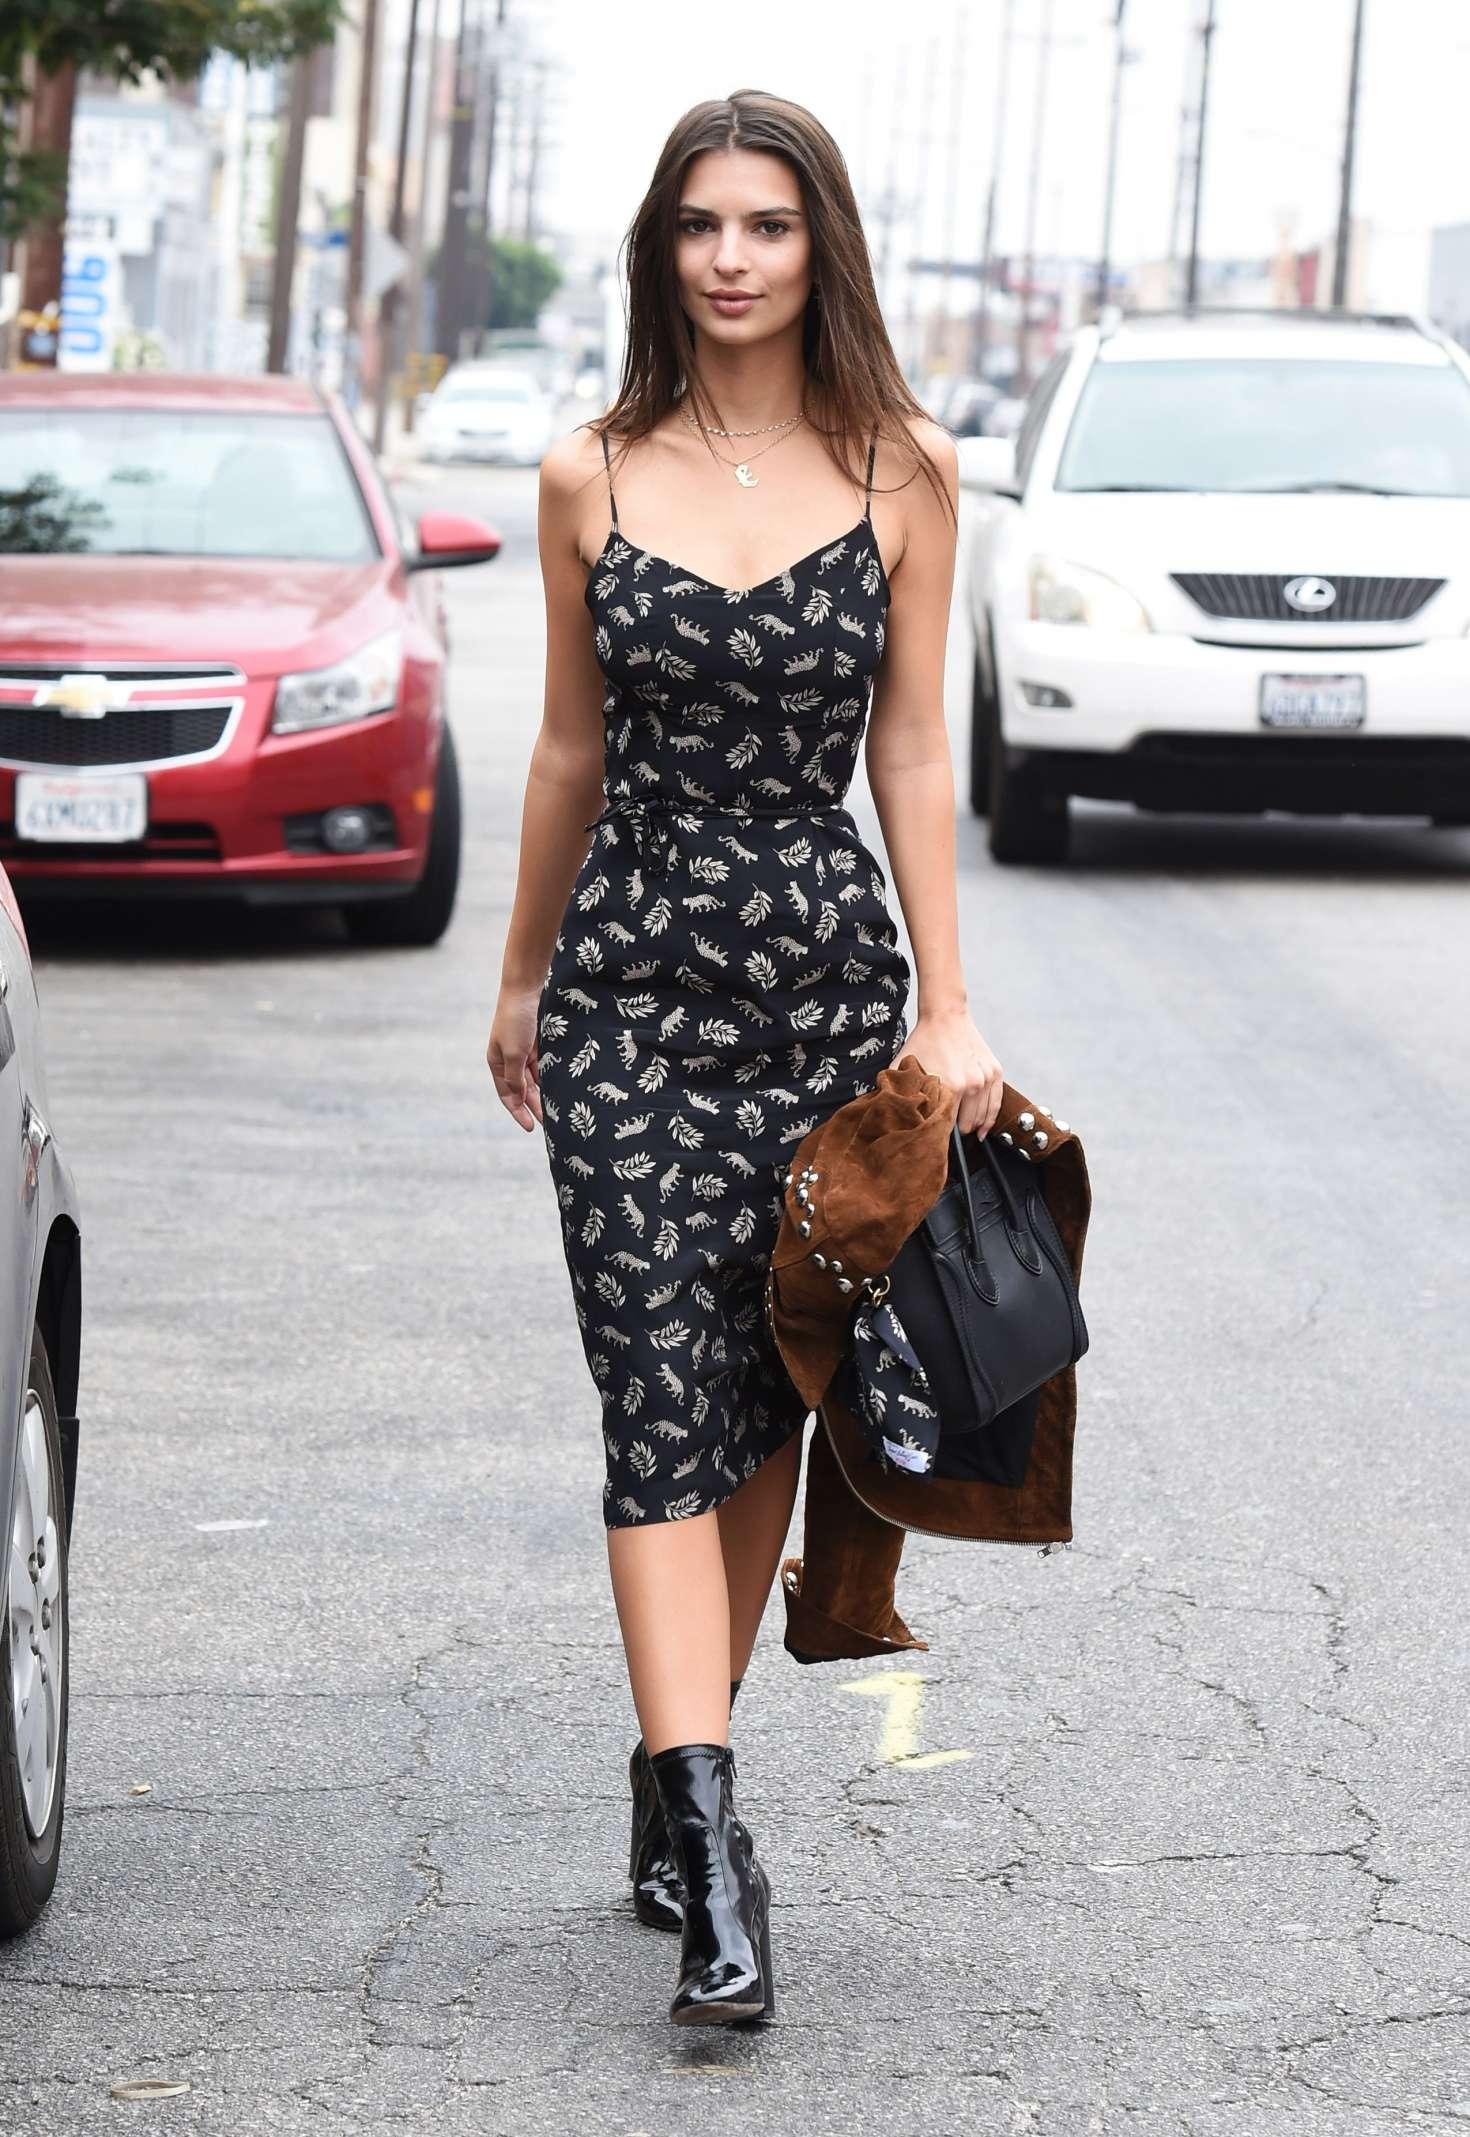 Emily Ratajkowski 2016 : Emily Ratajkowski in Summer Dress -20